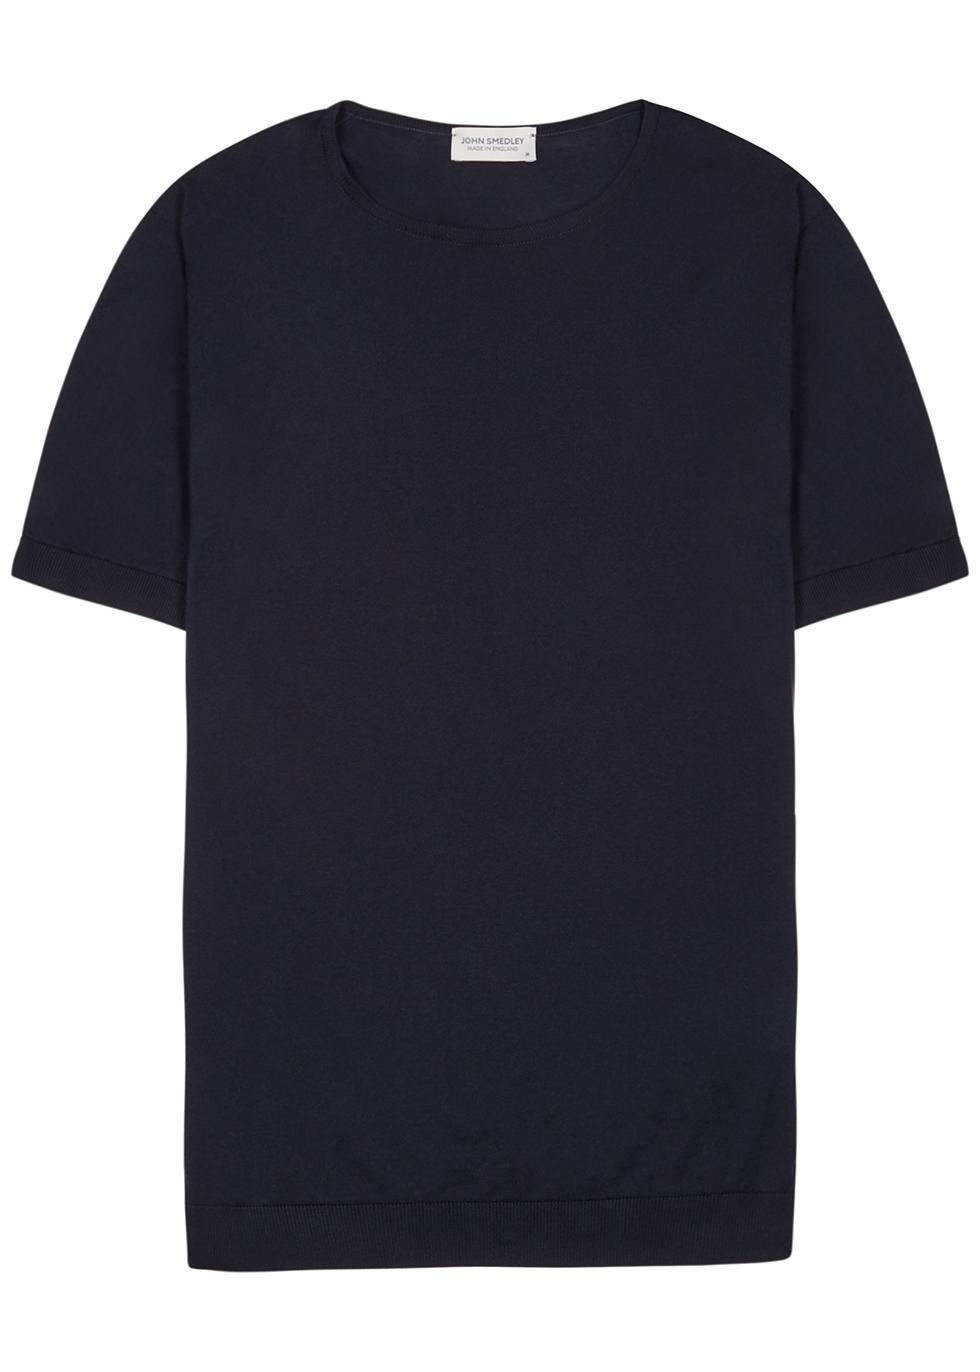 Belden navy fine-knit cotton T-shirt